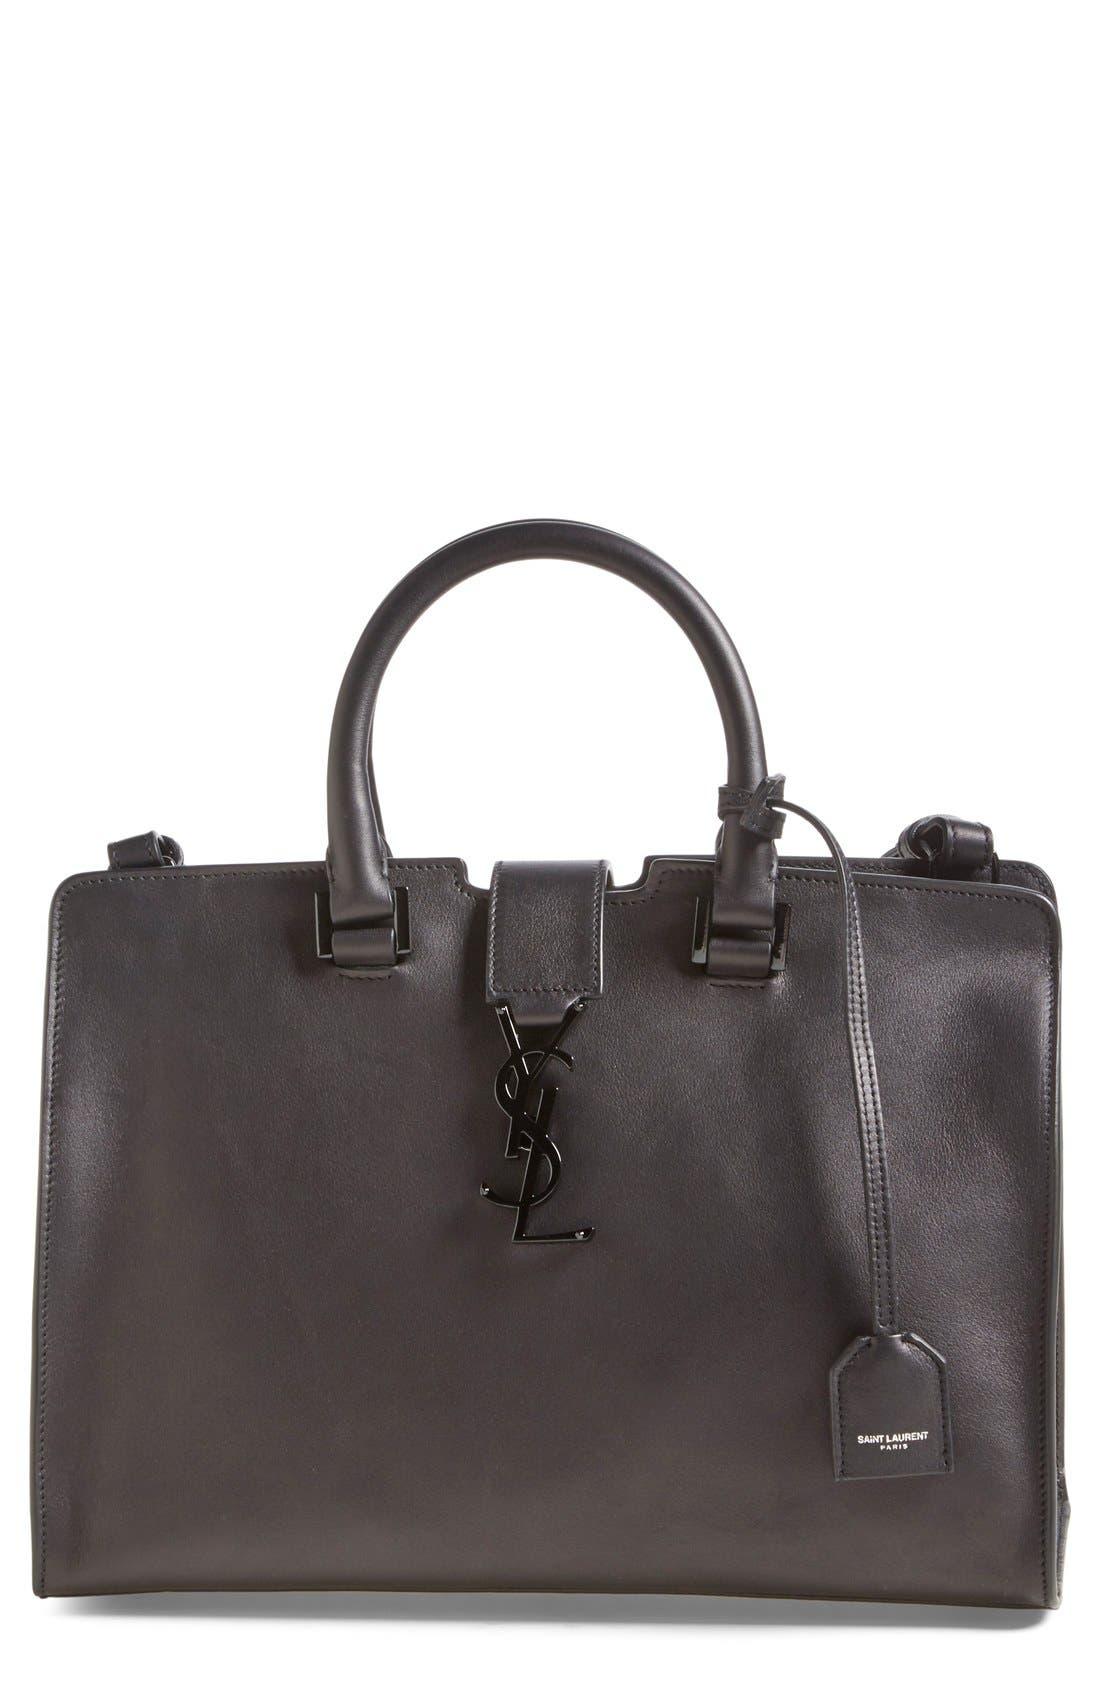 Alternate Image 1 Selected - Saint Laurent 'Small Cabas' Leather Satchel